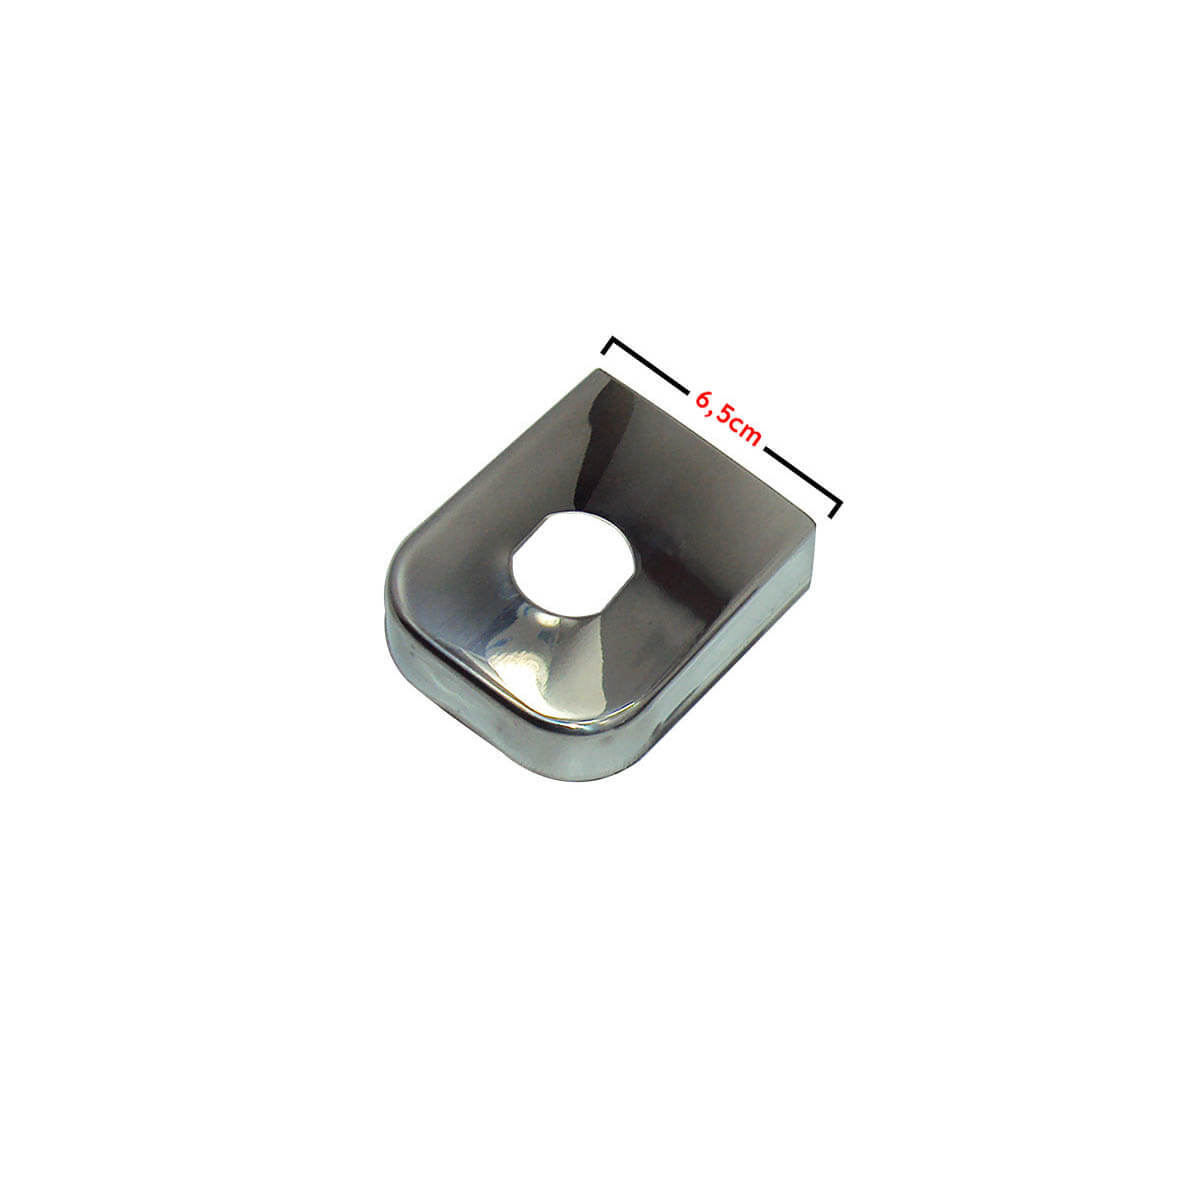 Capa inox para engate de reboque 6,5 cm de largura